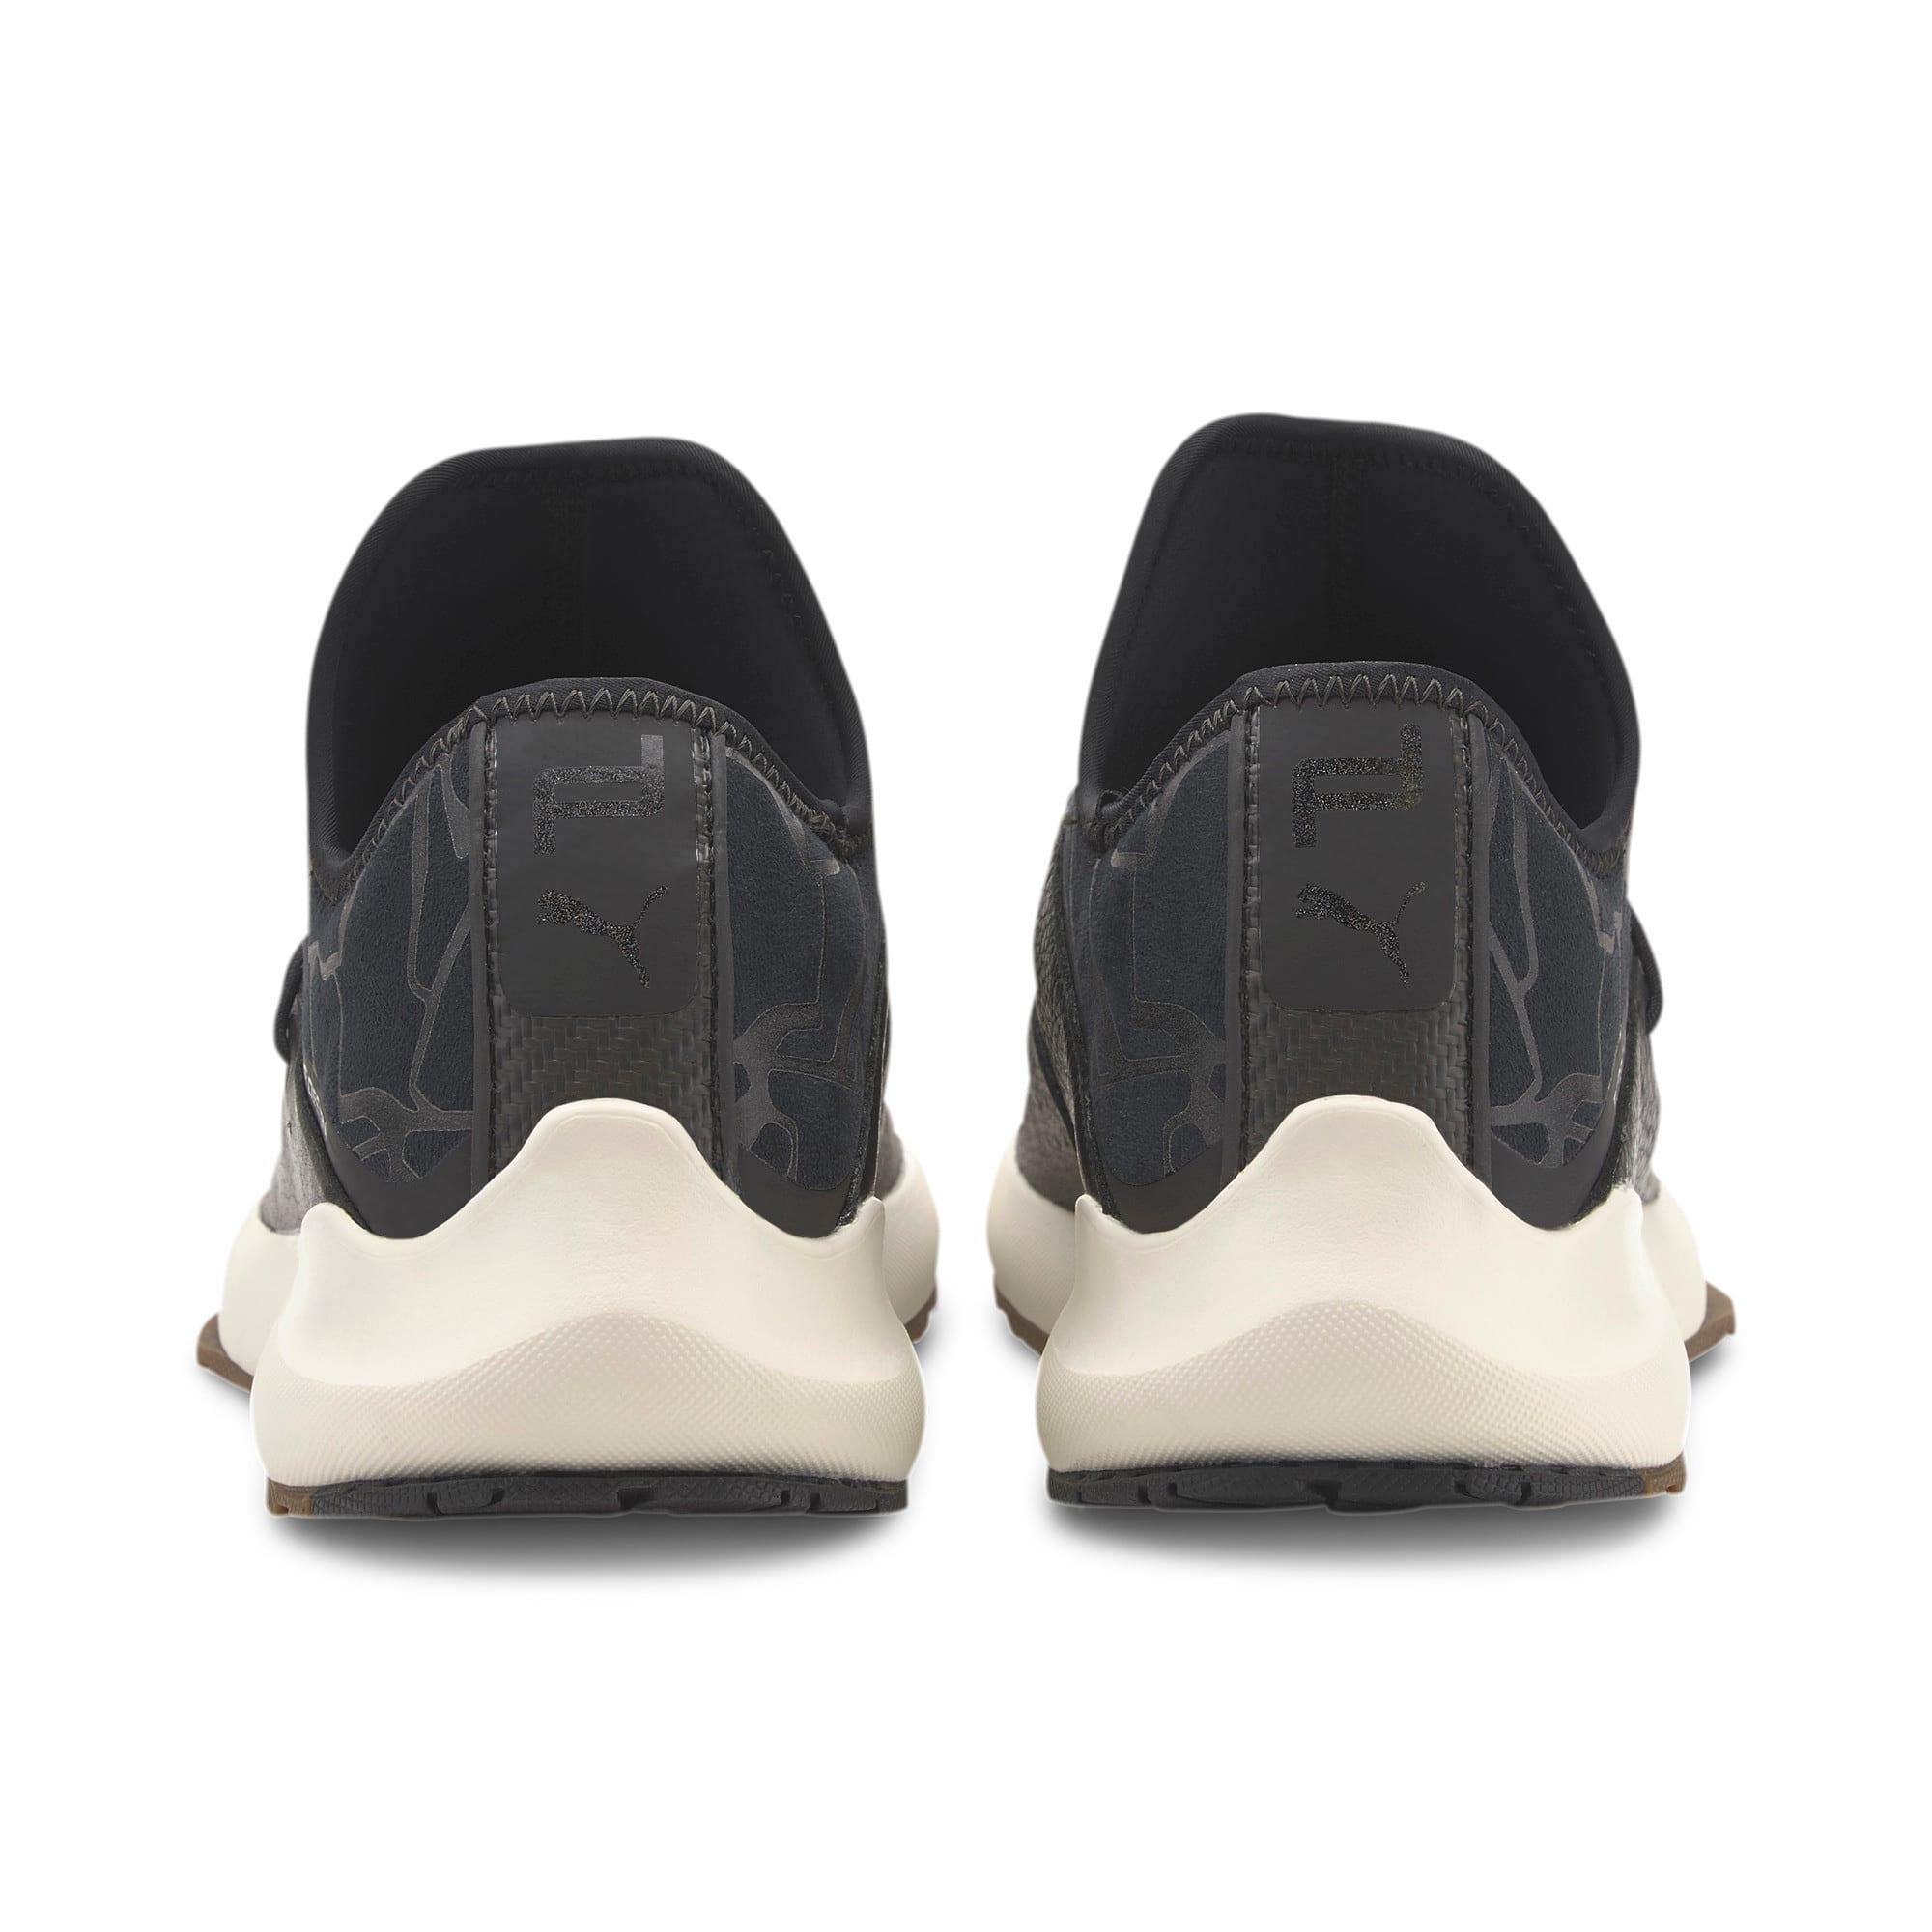 Imagen en miniatura 4 de Zapatillas de hombre Porsche Design Evo Cat II, JetBlack-JetBlack-WhisperWht, mediana